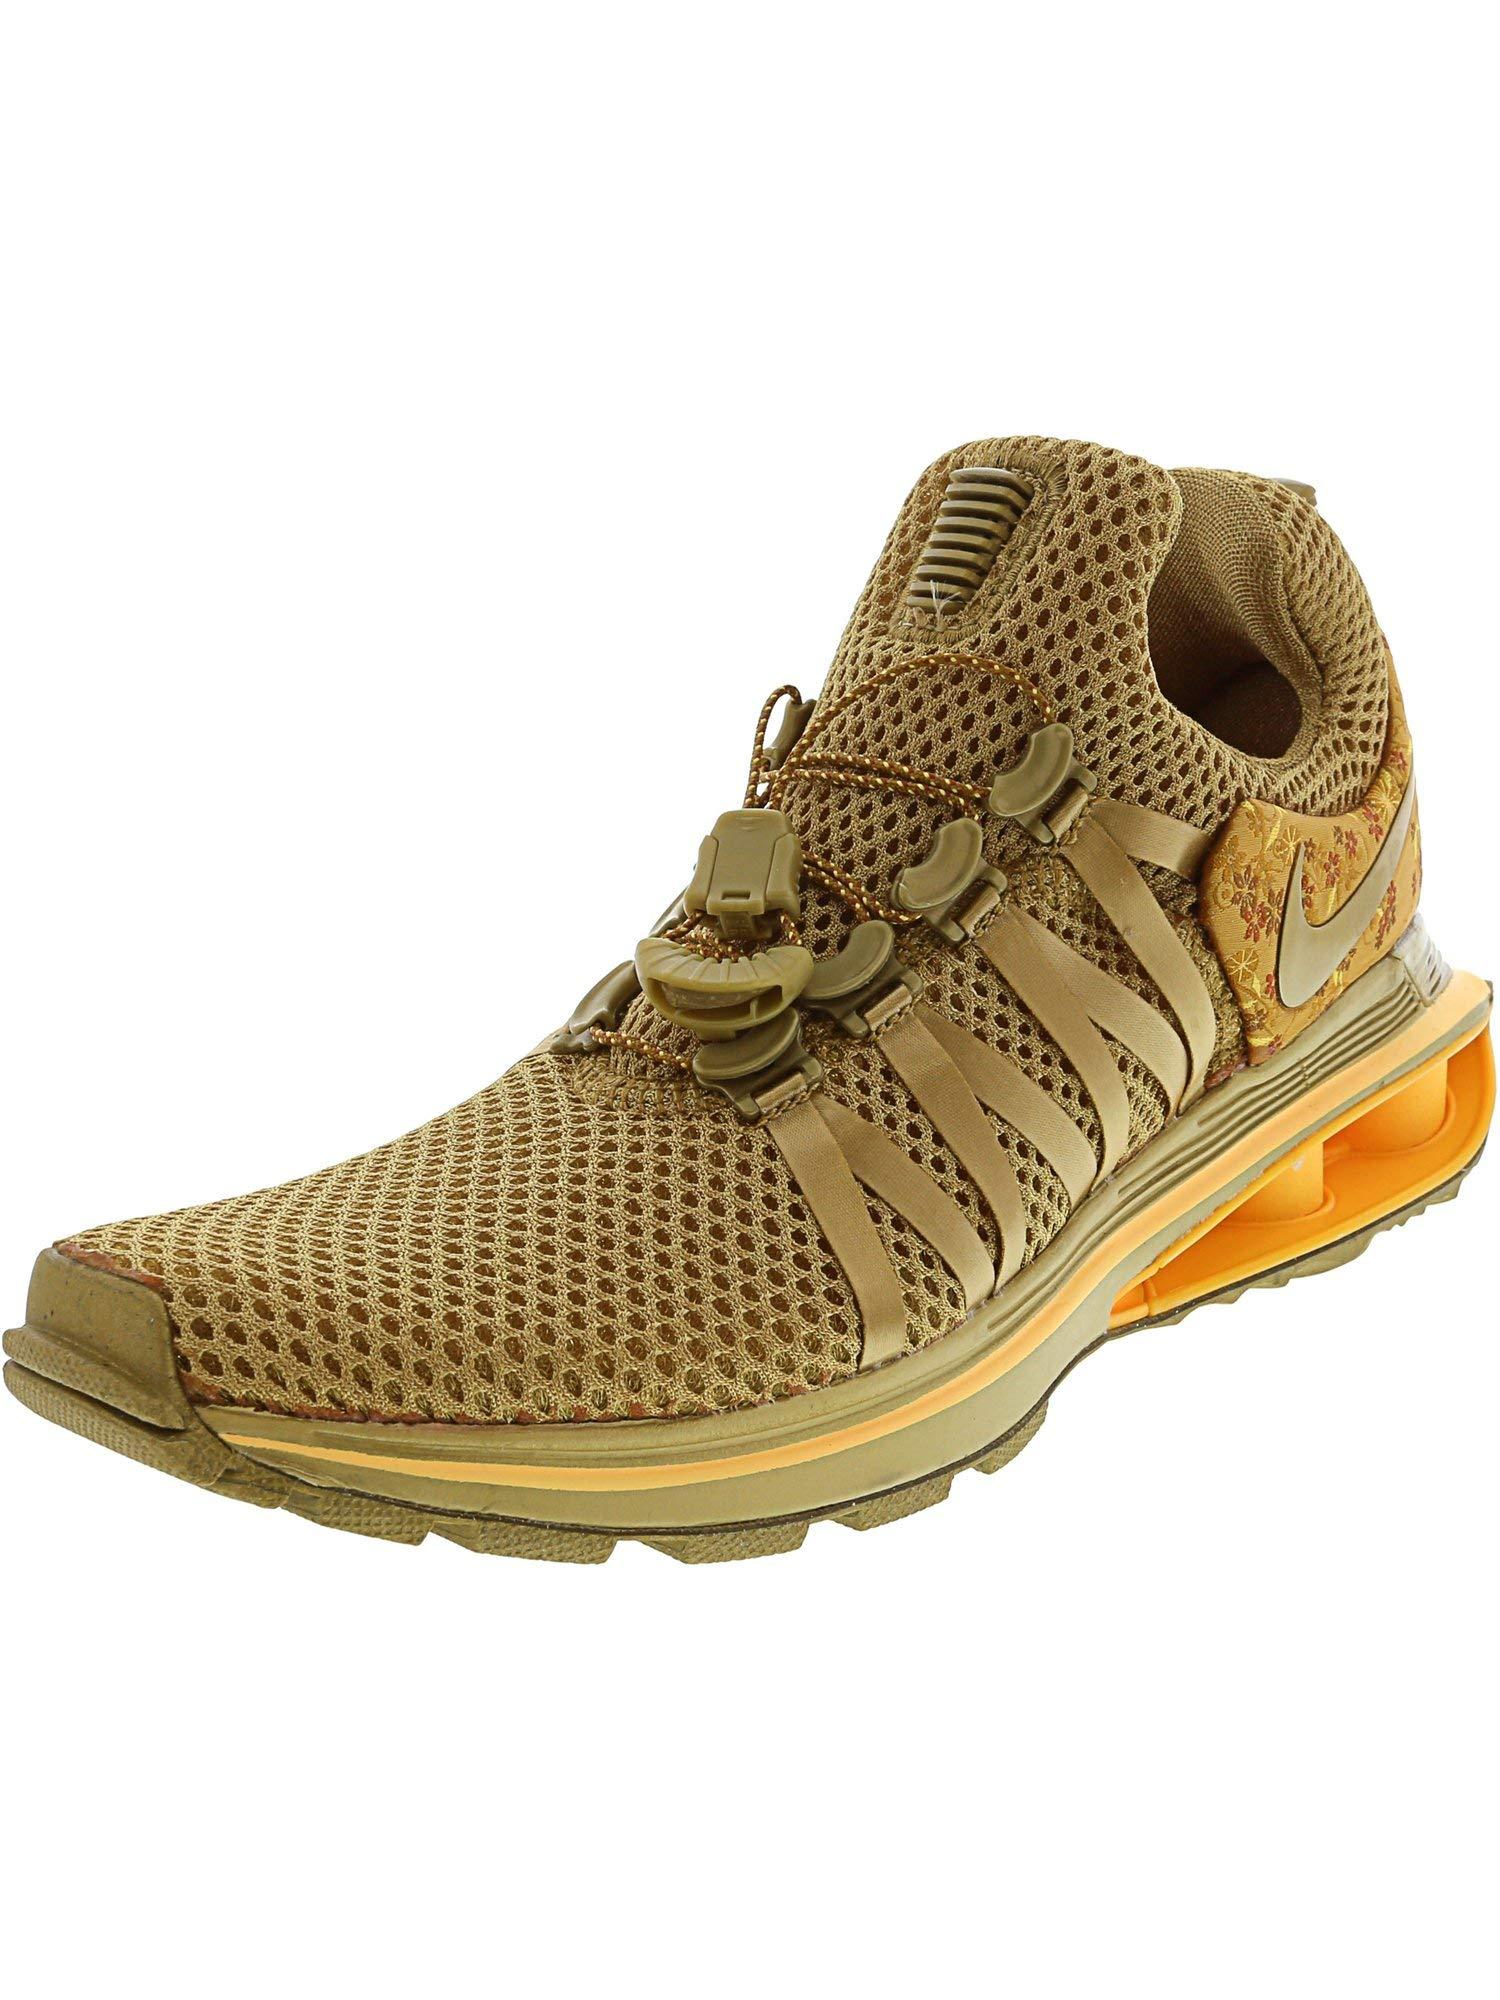 Nike Womens Shox Gravity Metallic Gold Running Shoe AQ8854-700 (6.5 B(M) US)